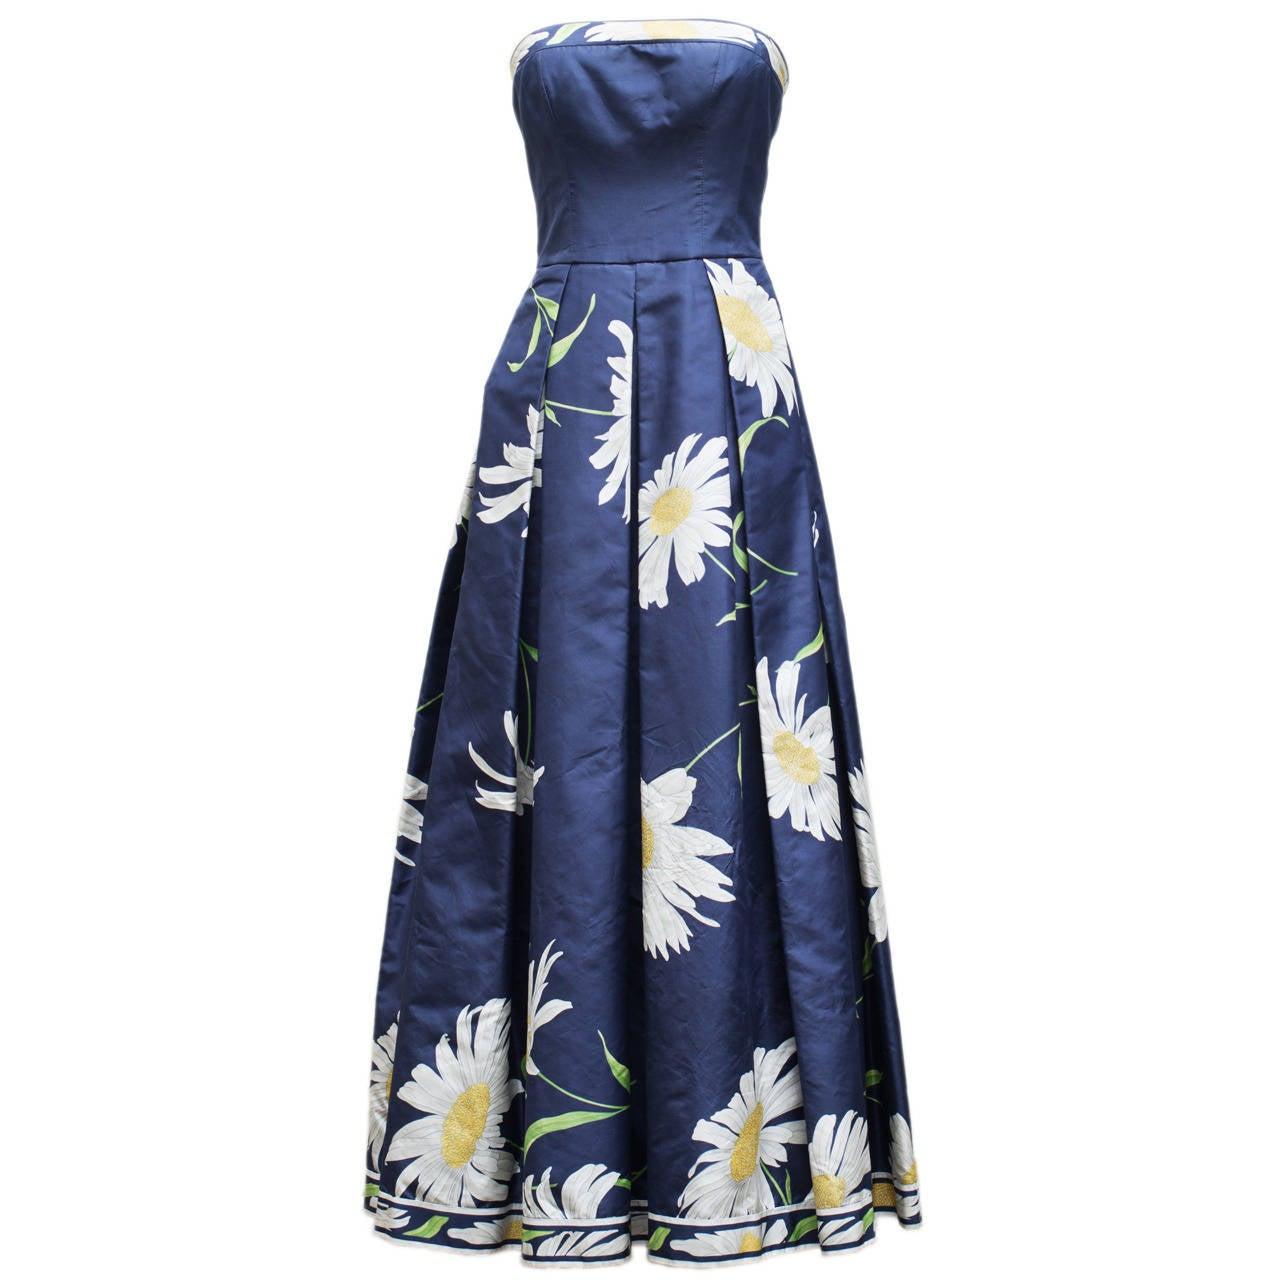 Leonard Charming Strapless Dress